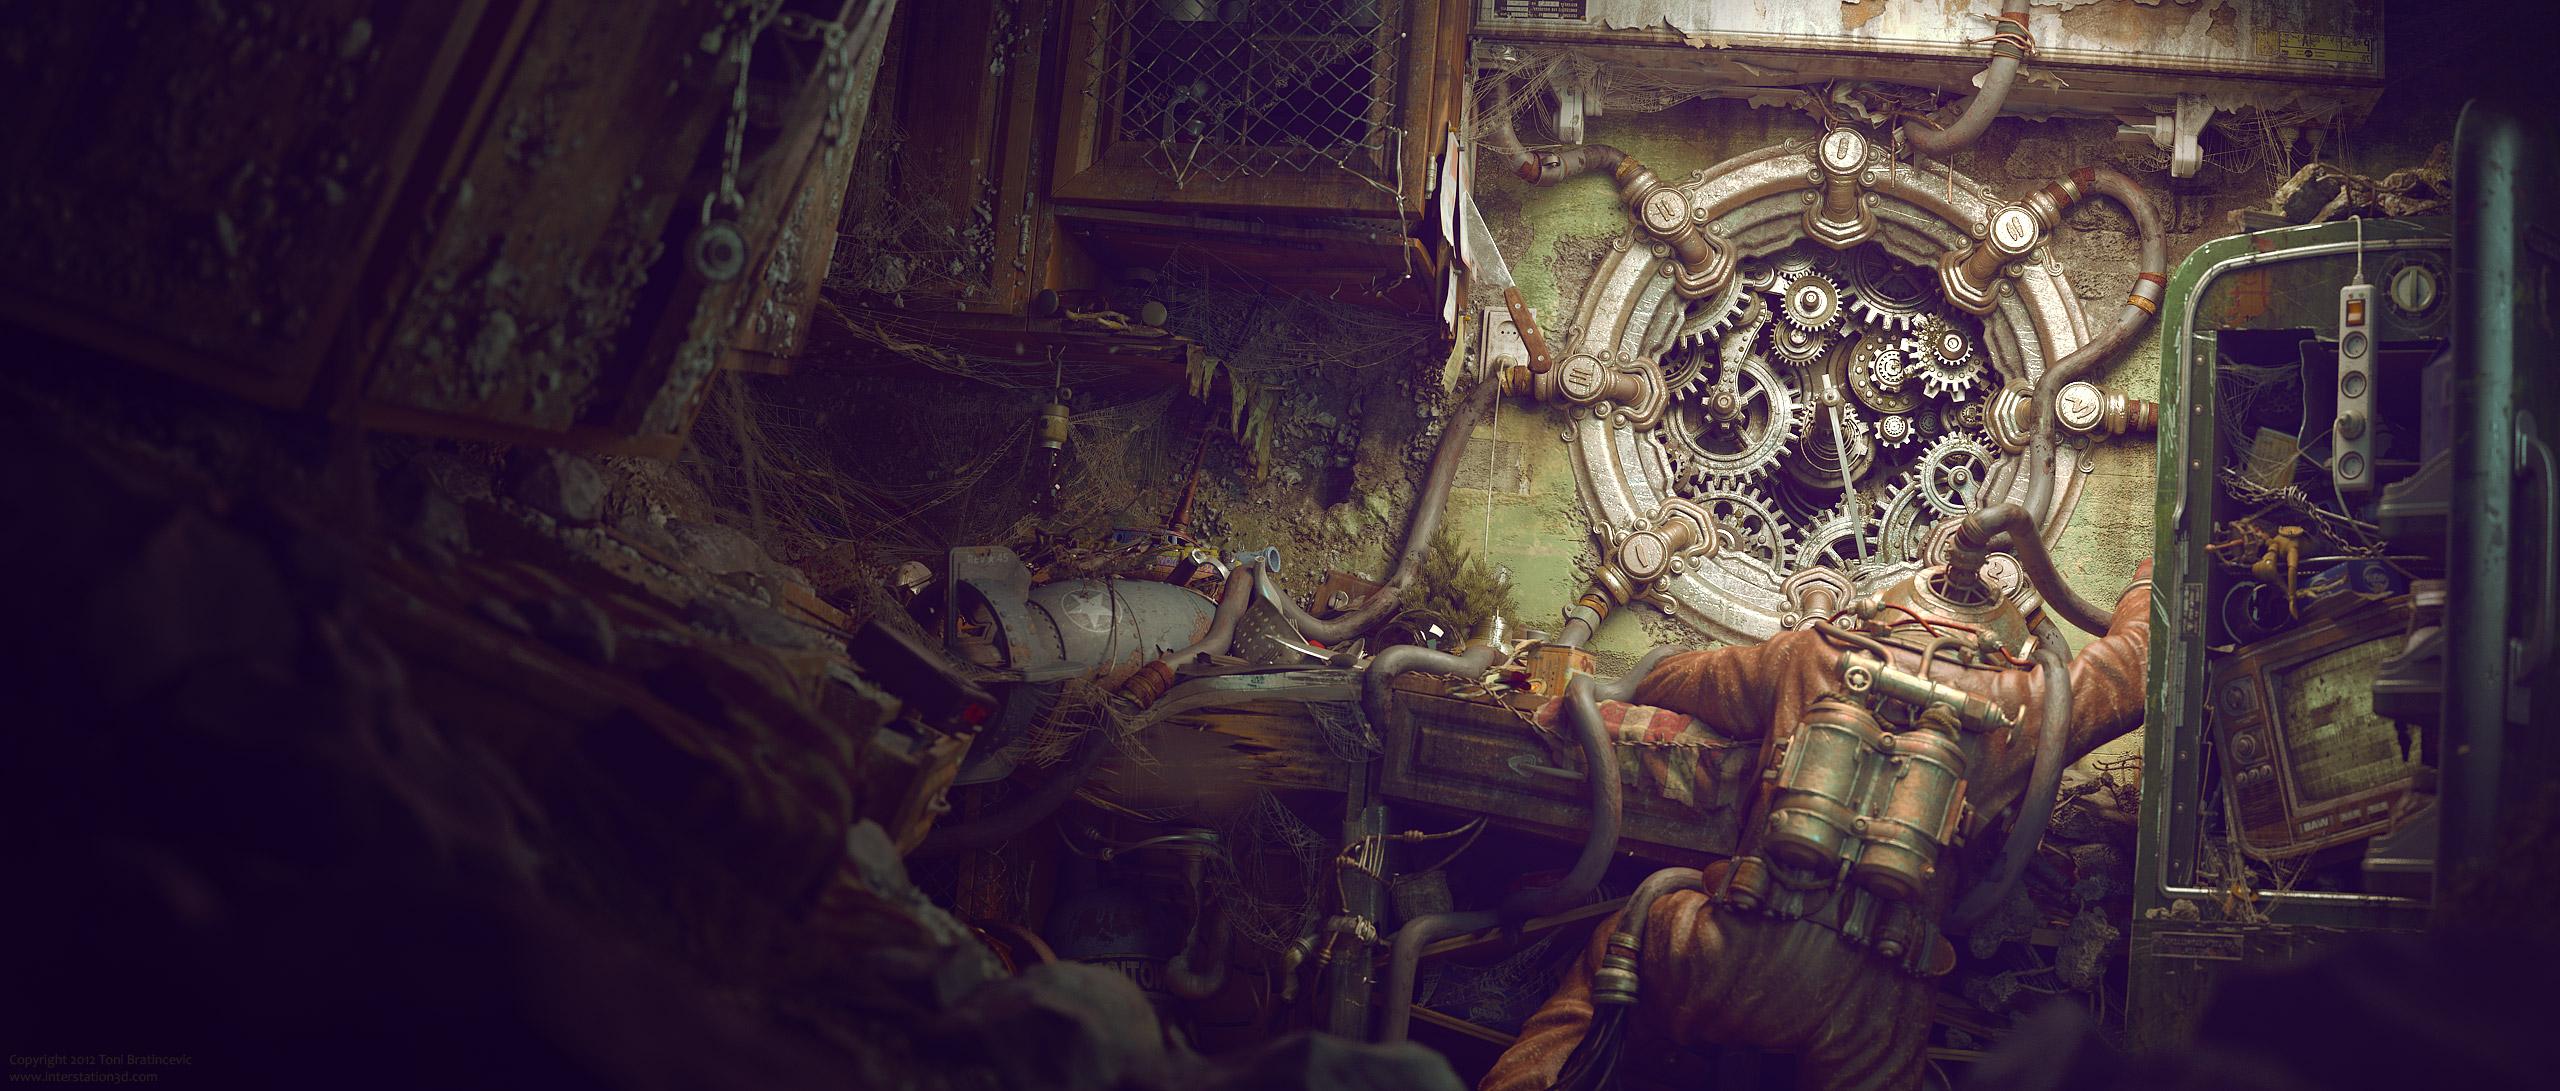 Sci-fi steampunk dark horror diving diver fantasy ...